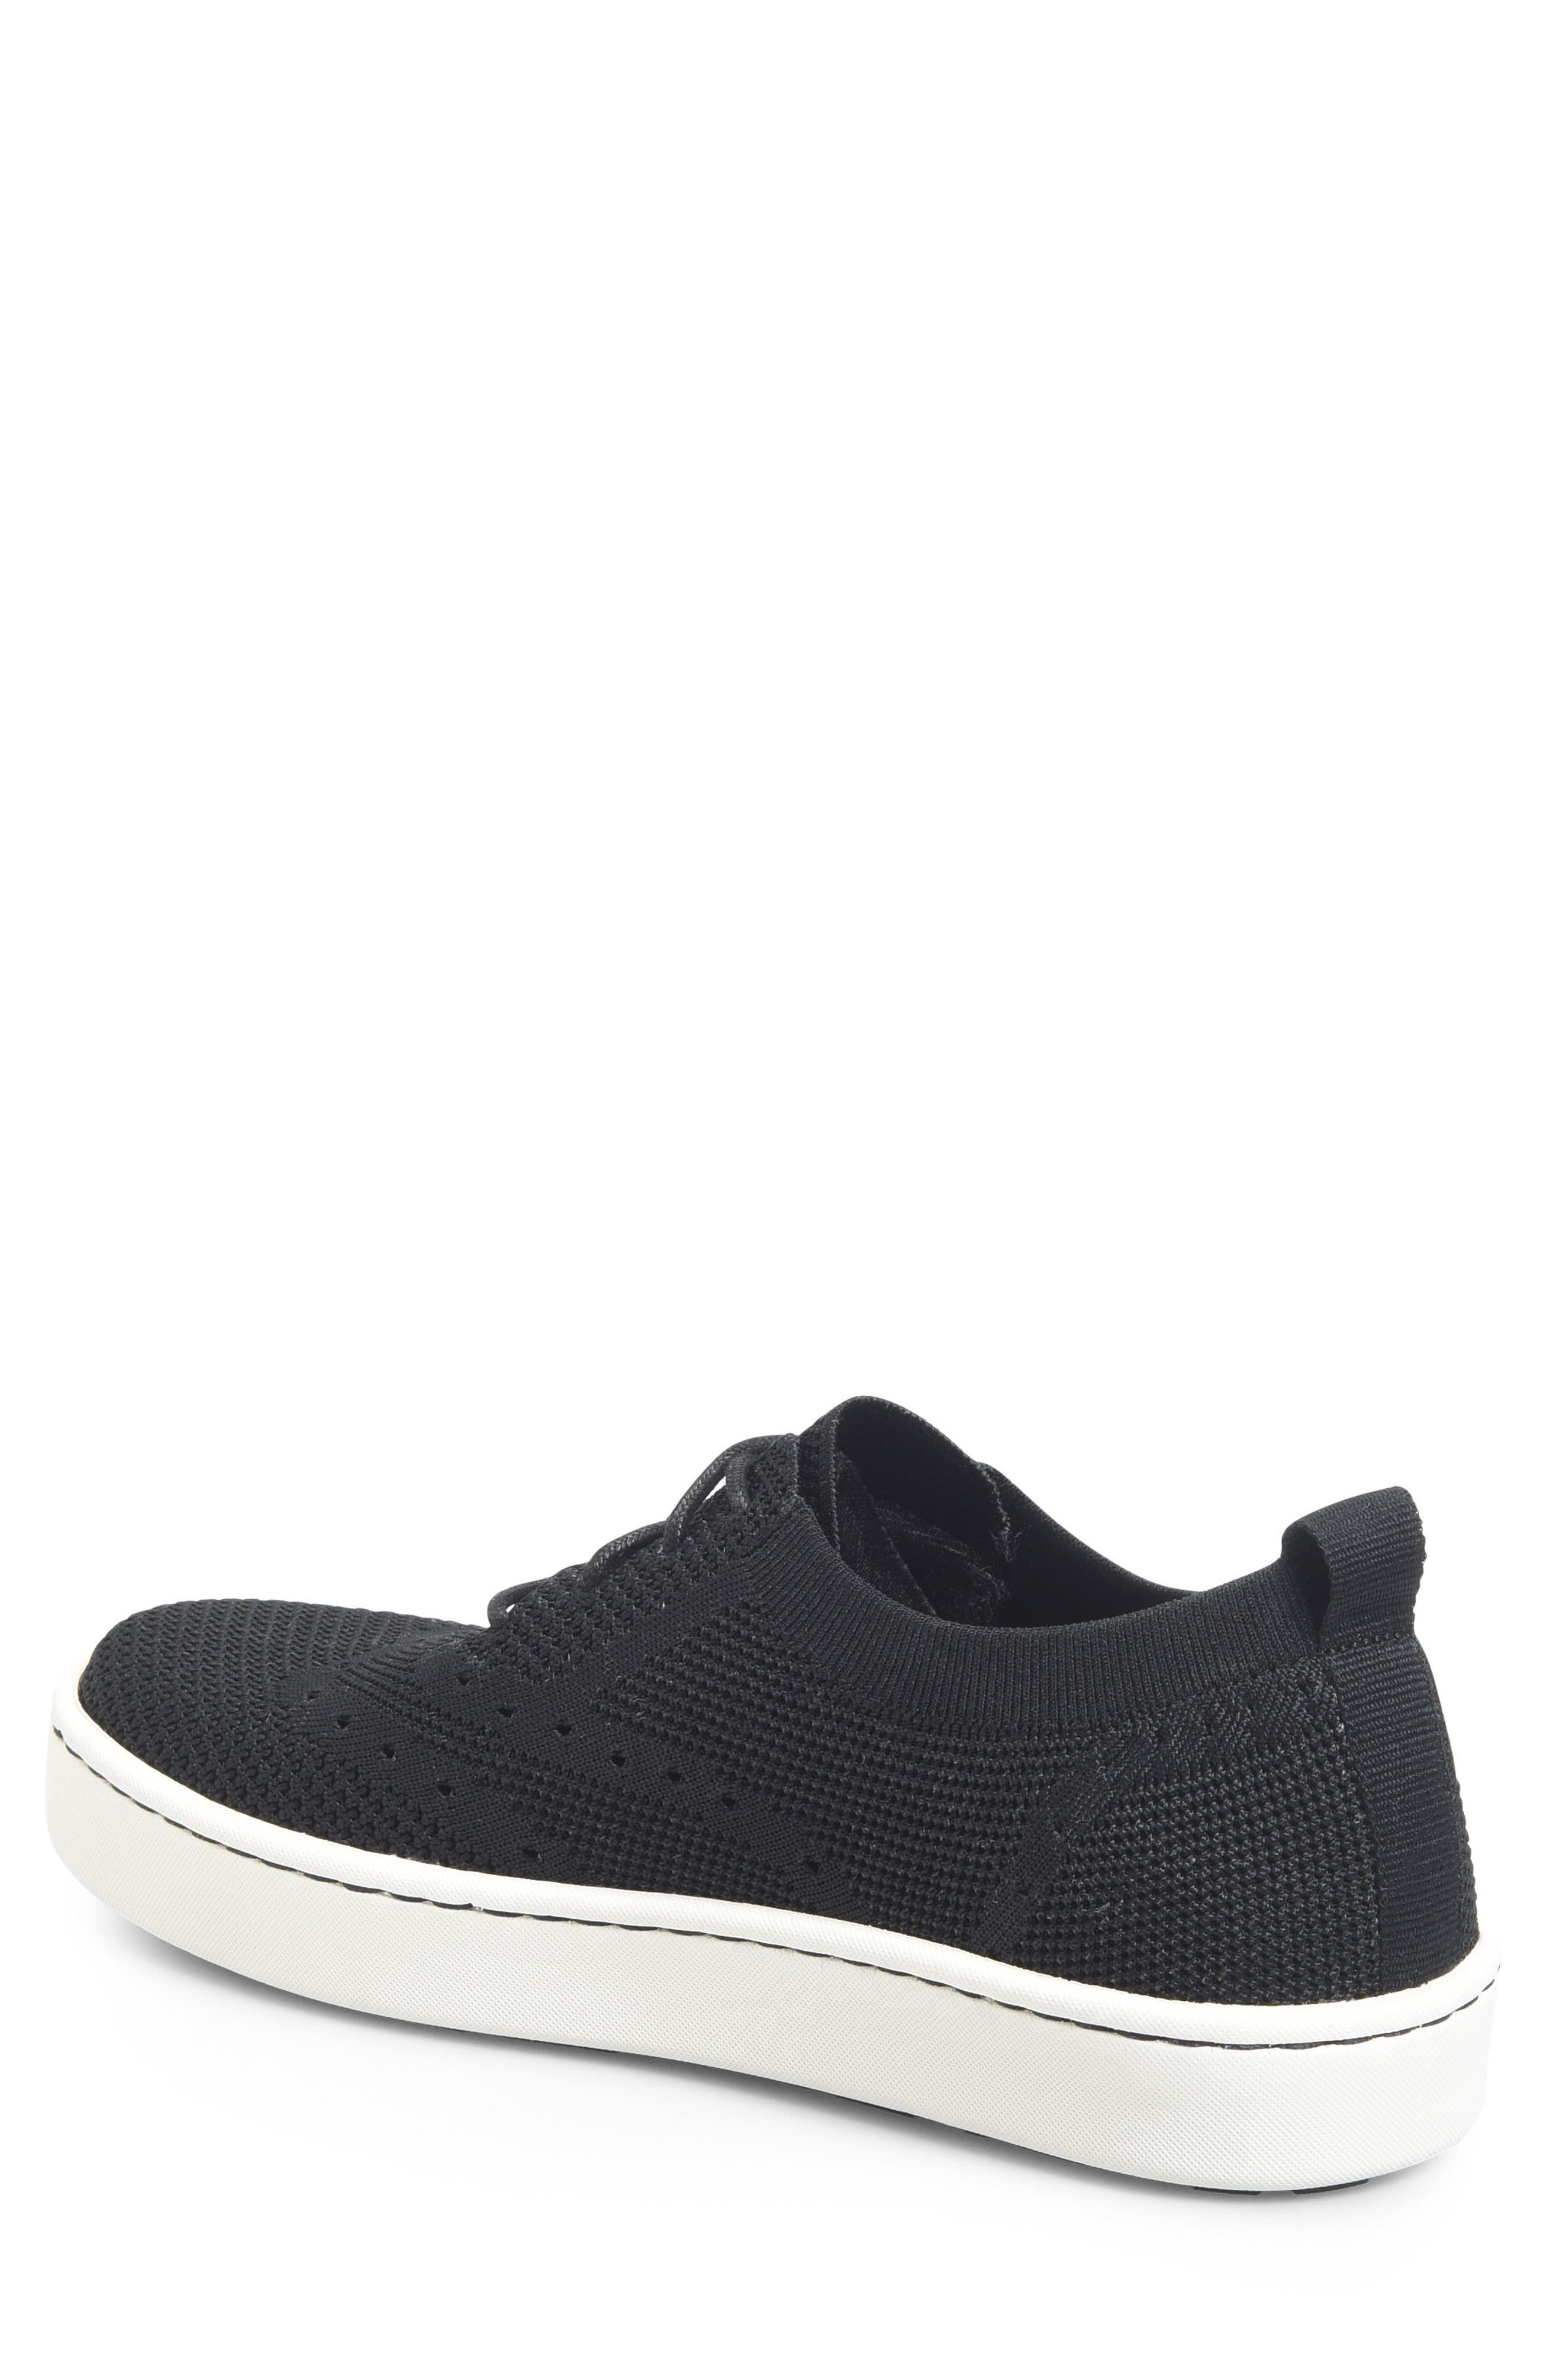 Bearse Sneaker,                             Alternate thumbnail 2, color,                             001